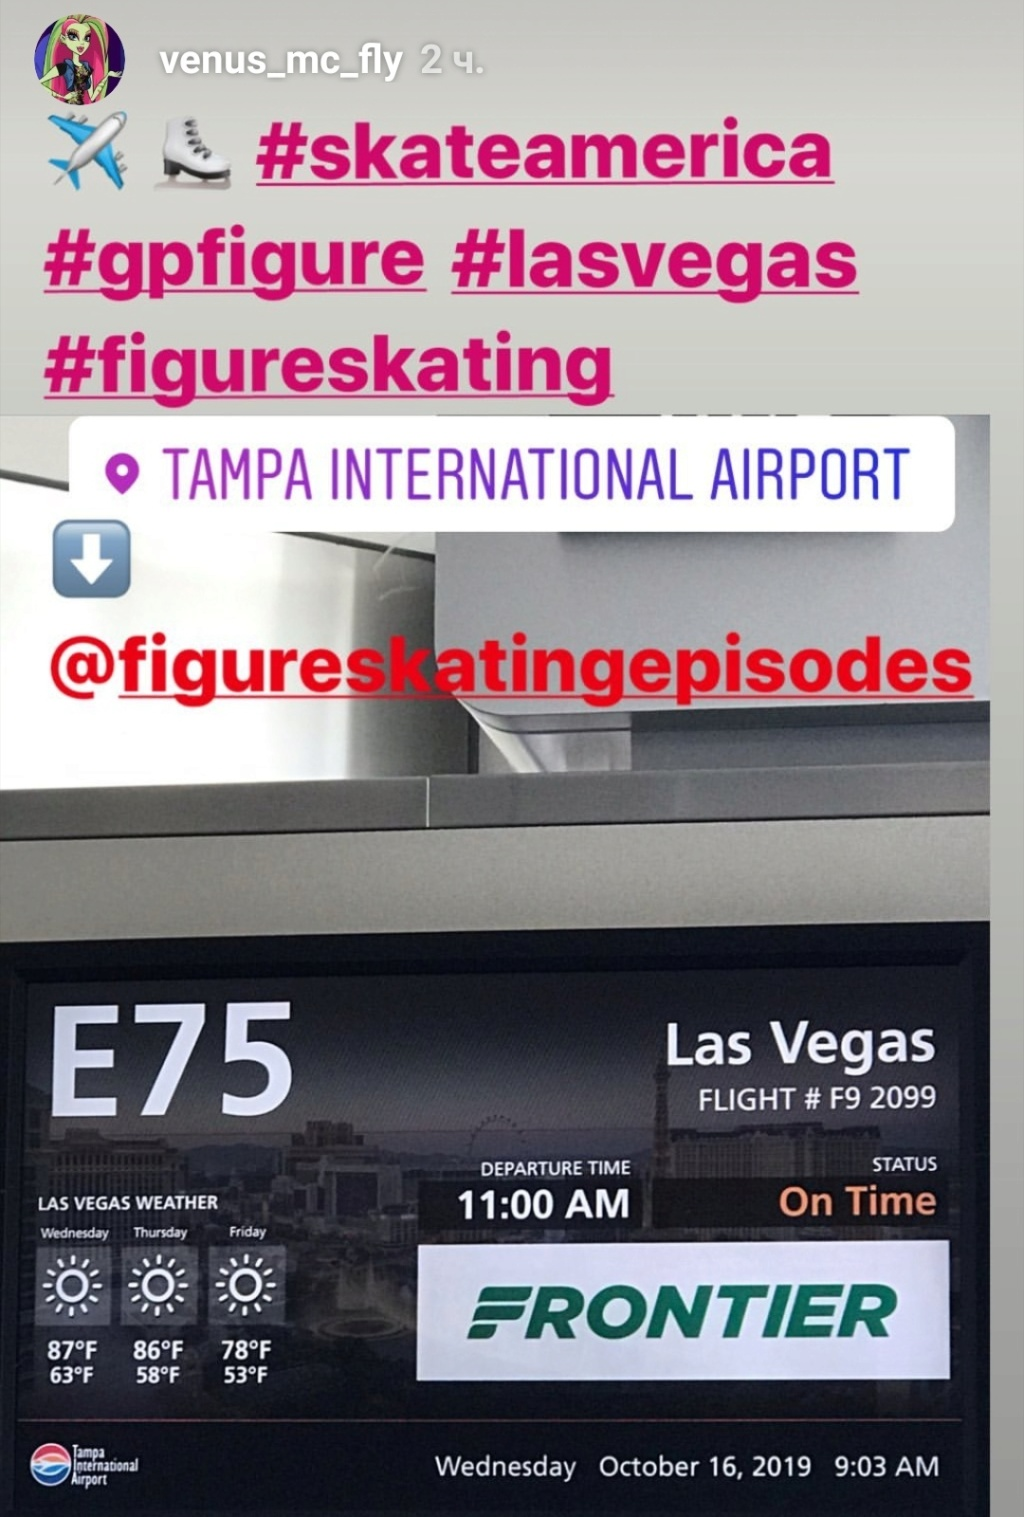 GP - 1 этап. Skate America Las Vegas, NV / USA October 18-20, 2019   Screen45